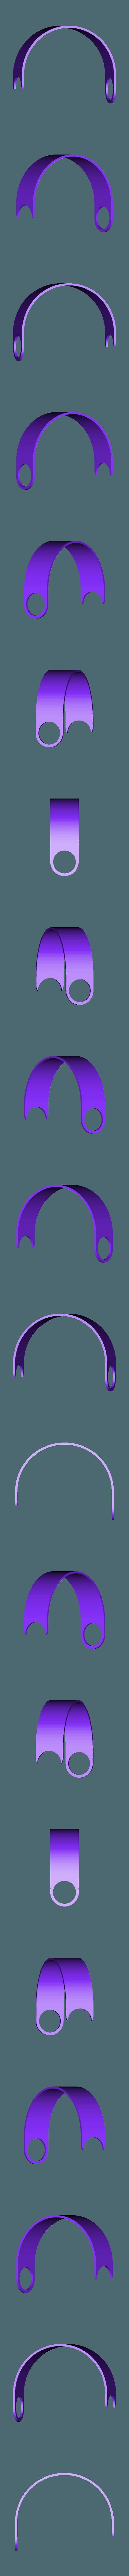 Saber_Guard_v2.stl Télécharger fichier STL gratuit Sabre laser Jedi, avec garde et cristal Kyber • Design imprimable en 3D, Piggie